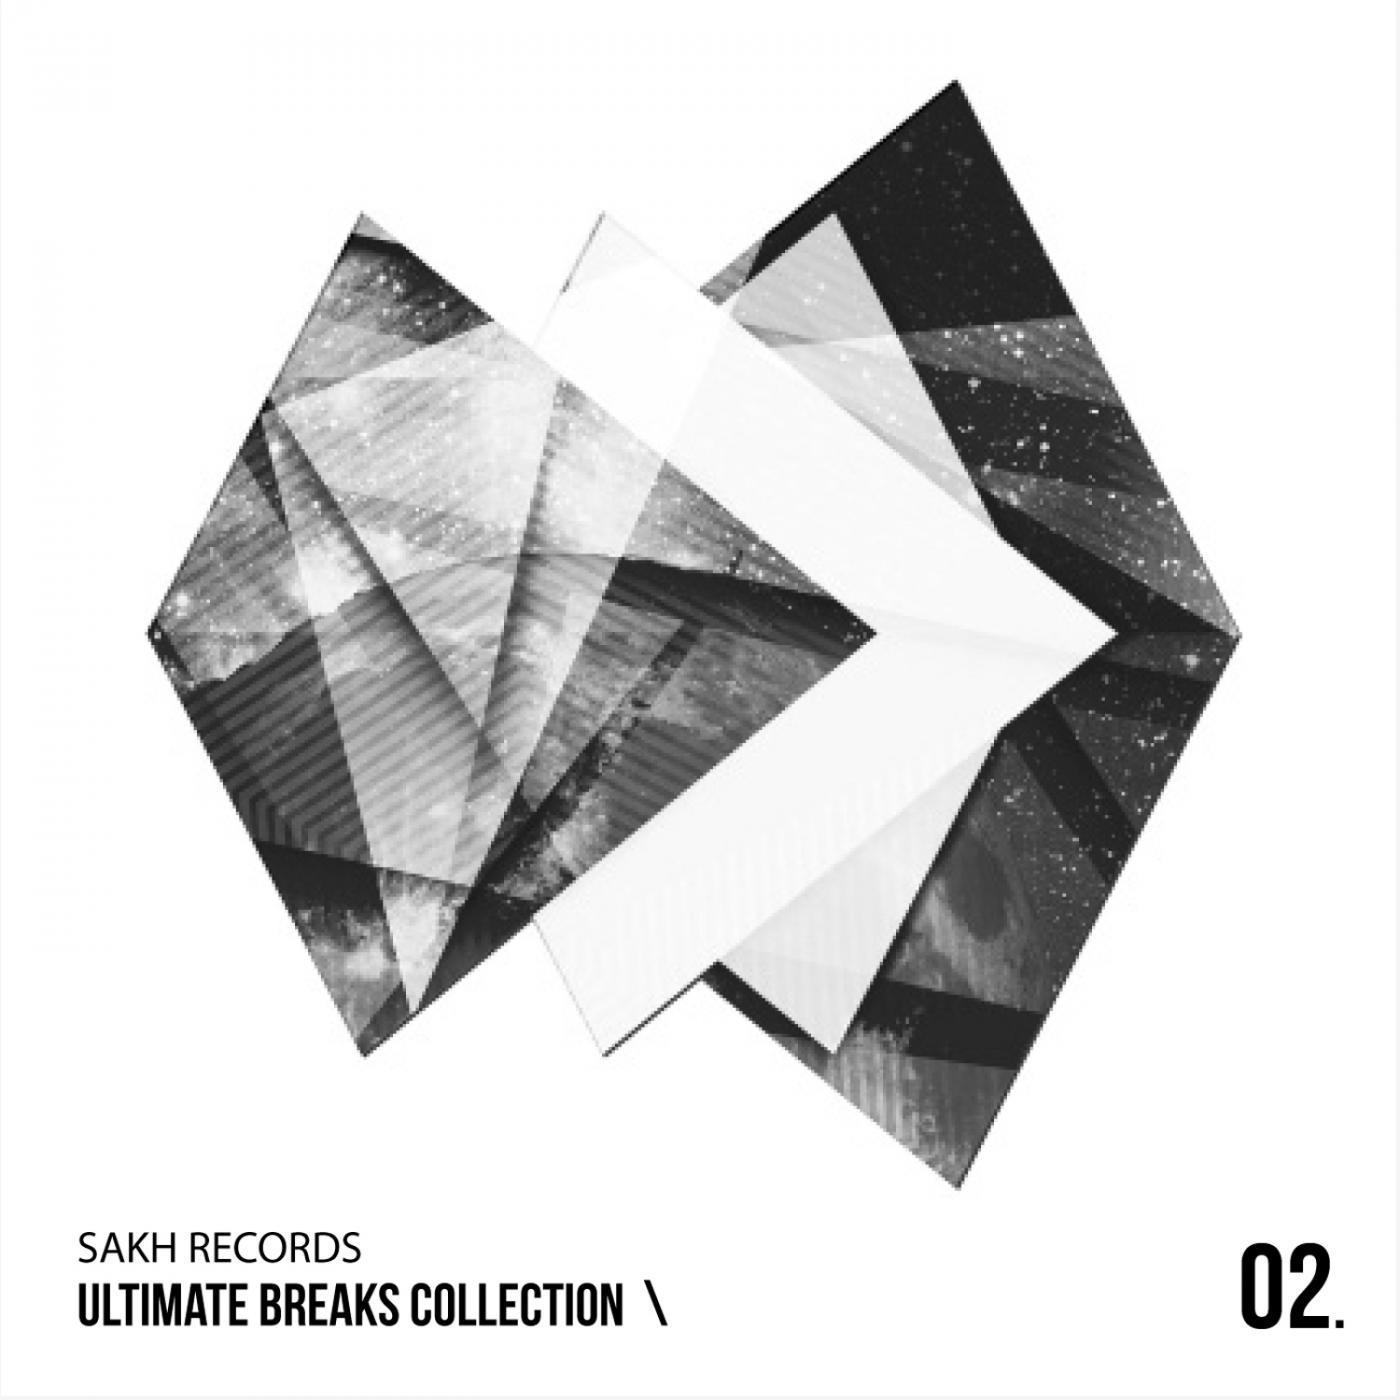 JamieB - Twisted Crystal (Original Mix)